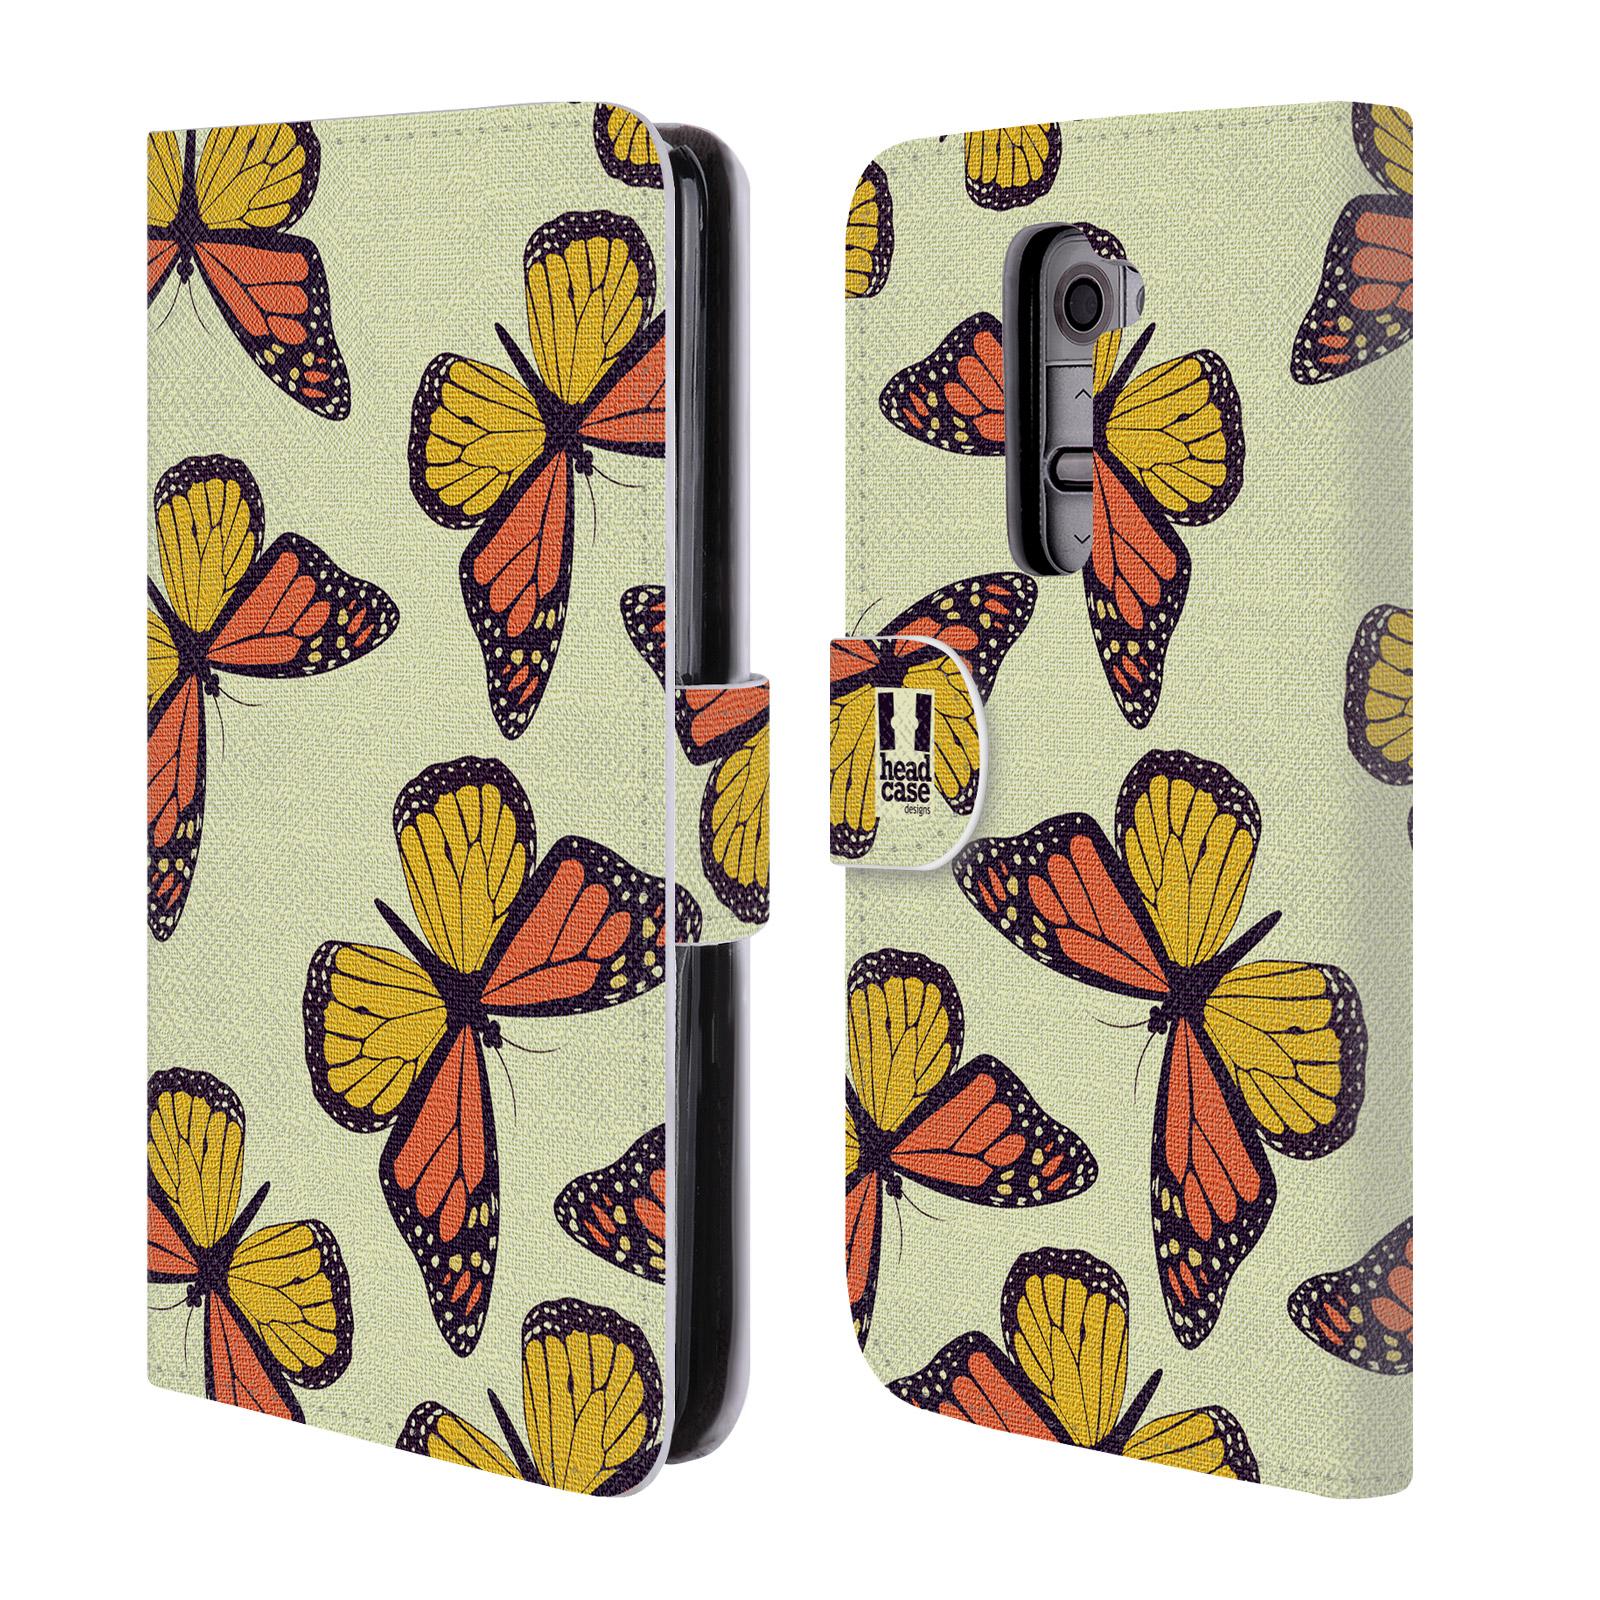 HEAD CASE Flipové pouzdro pro mobil LG G2 (D802) Vzorkovaný motýl Monarcha oranžová